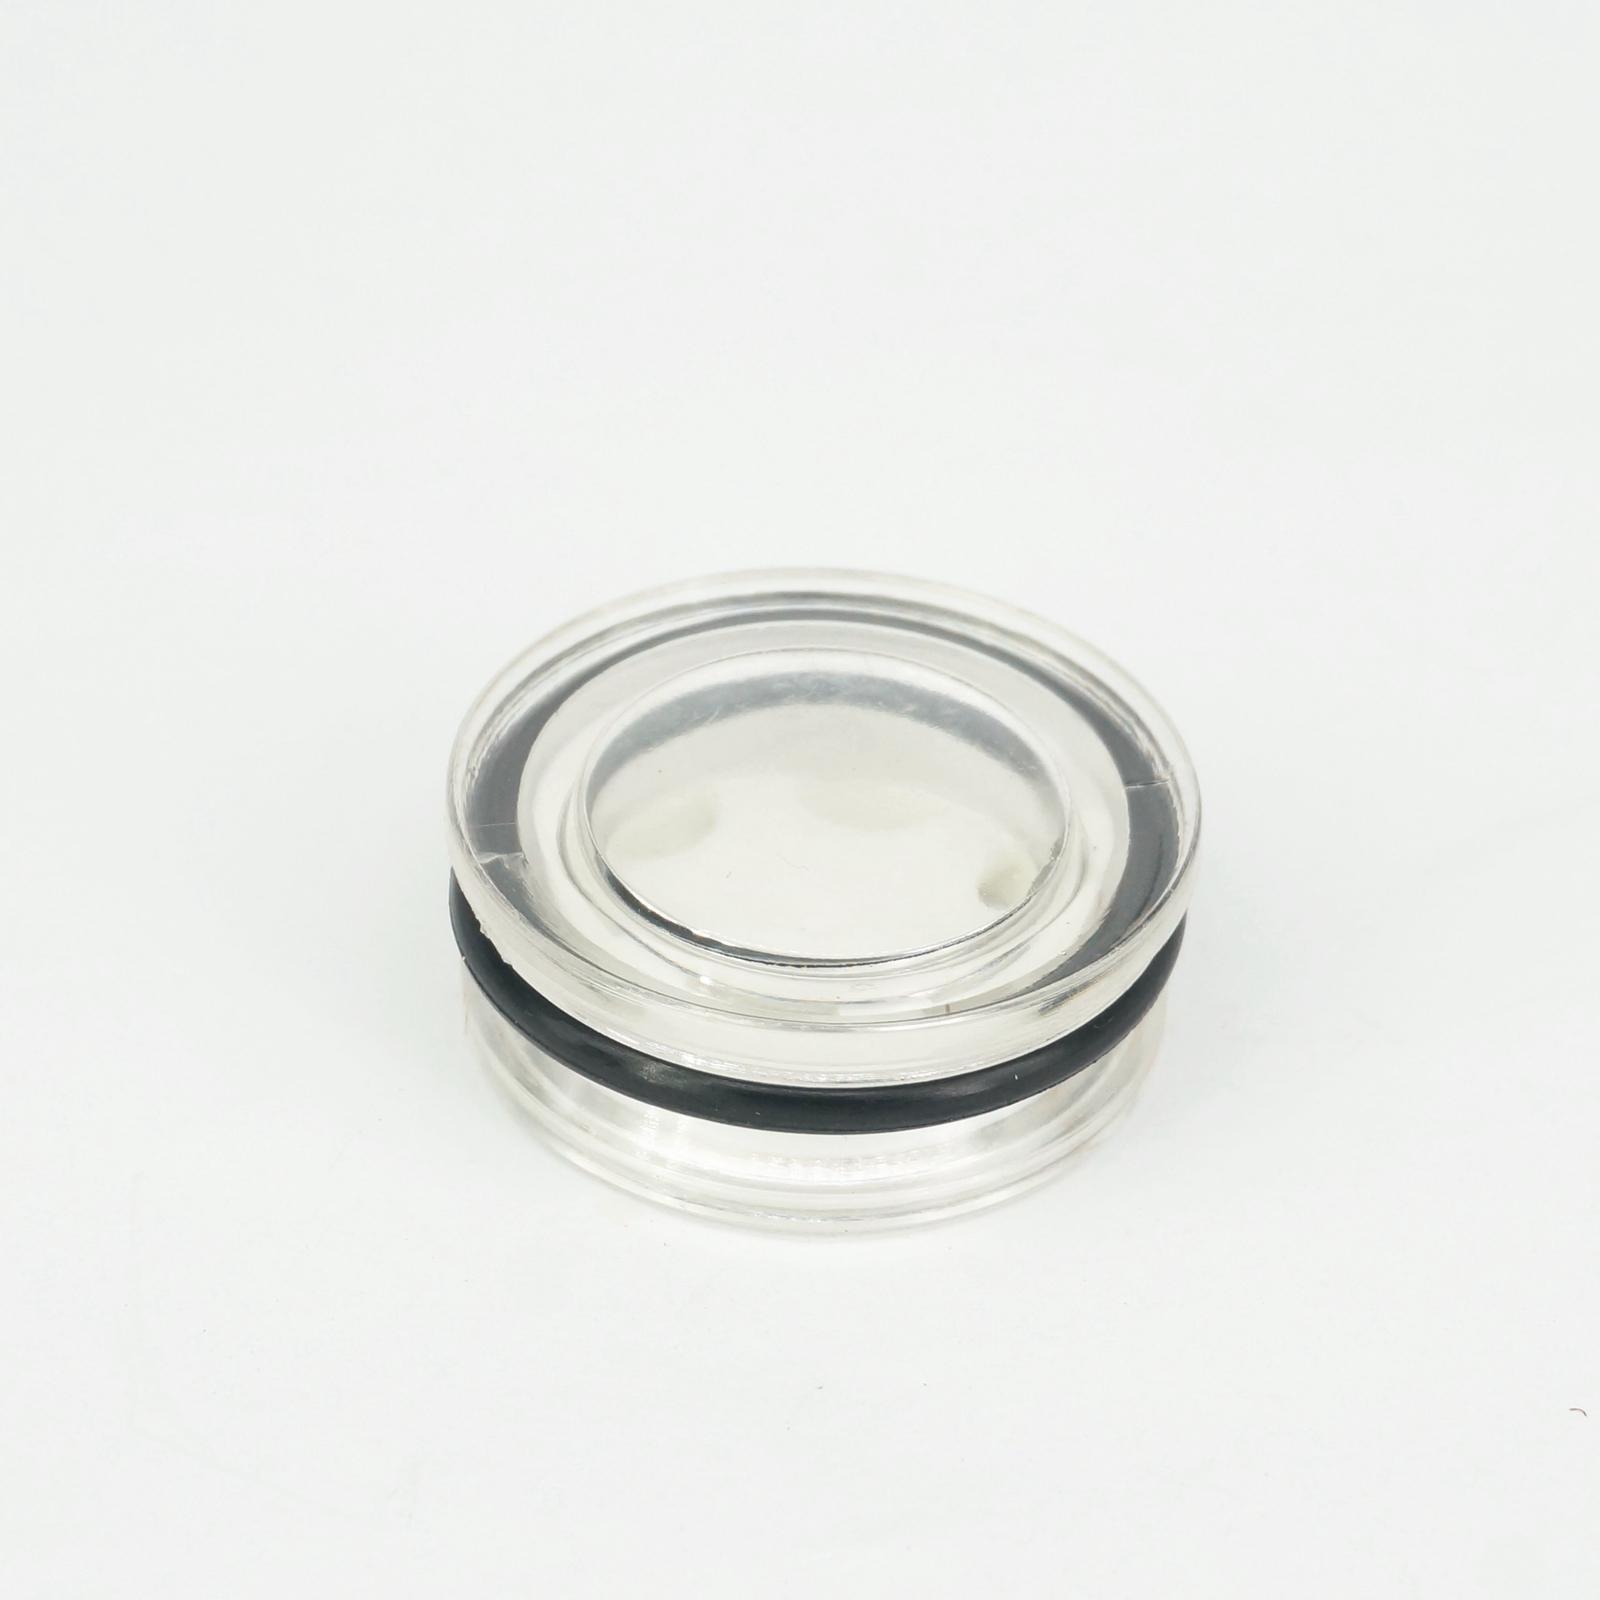 6 piezas de plástico transparente cabeza hexagonal Rosca 20mm Compresor de aire de nivel de aceite mirilla